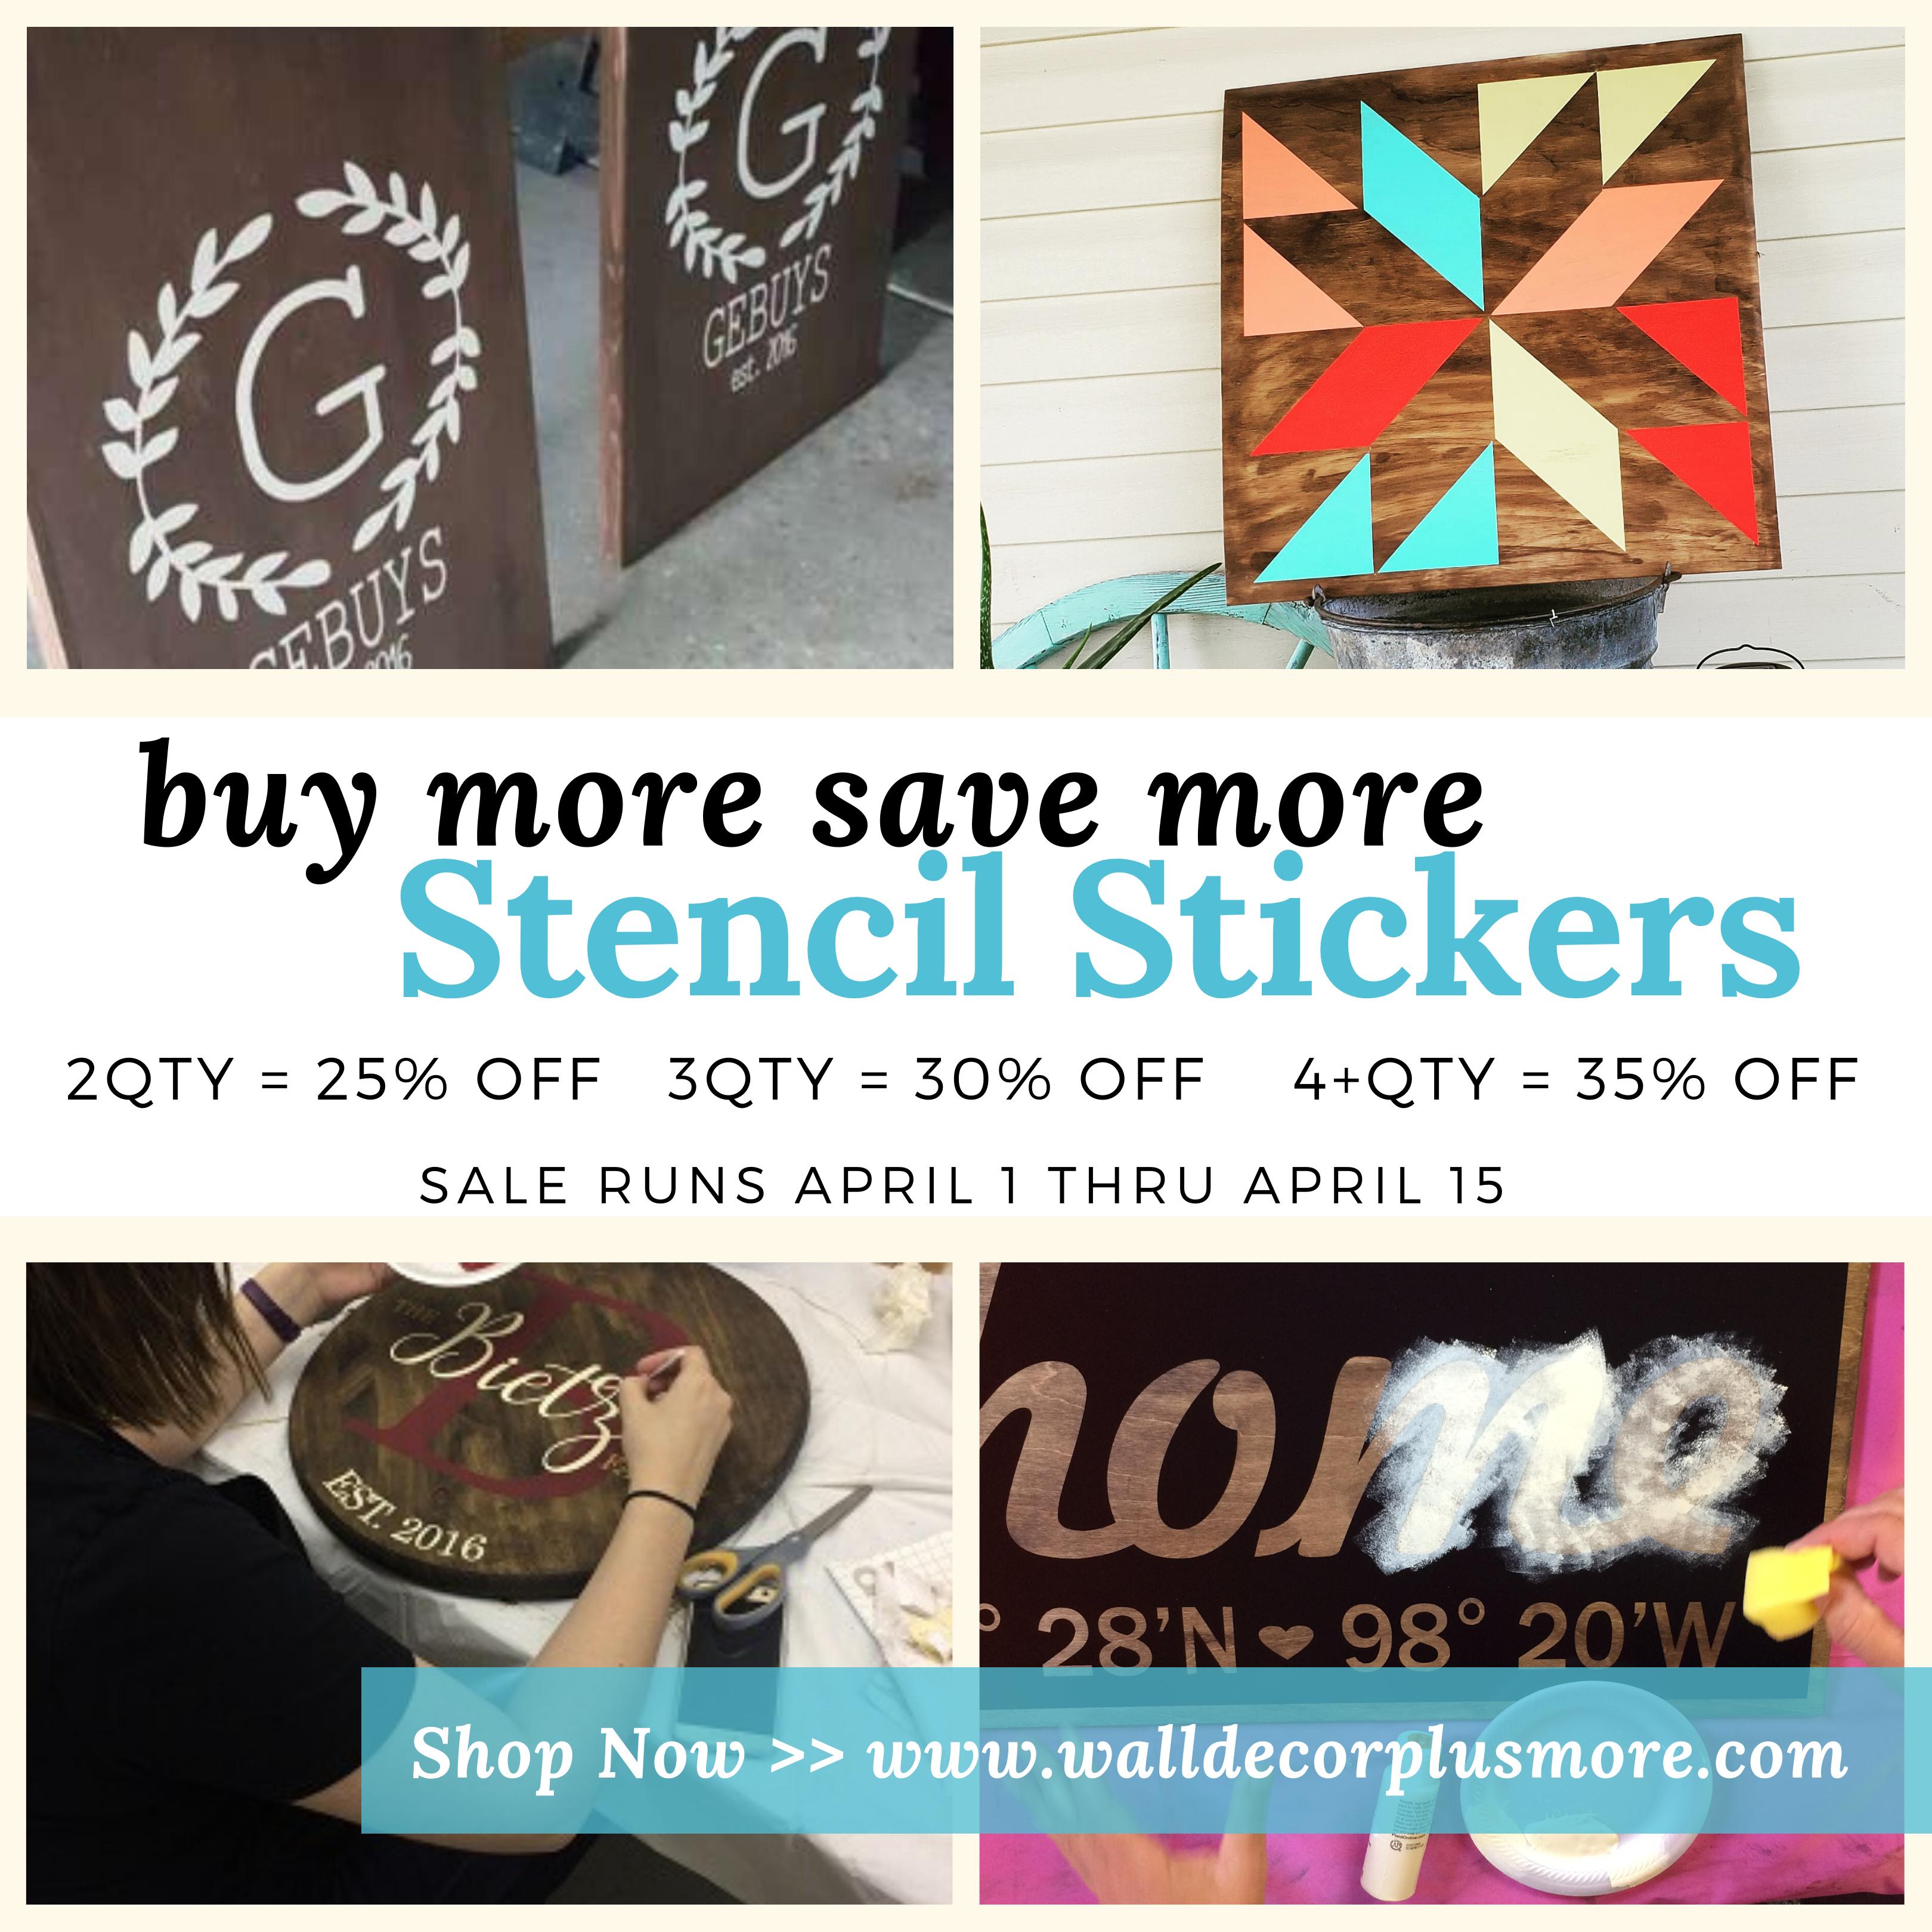 stencil-sticker-buy-more-save-more-sale-april-1-15-ig-fb.png